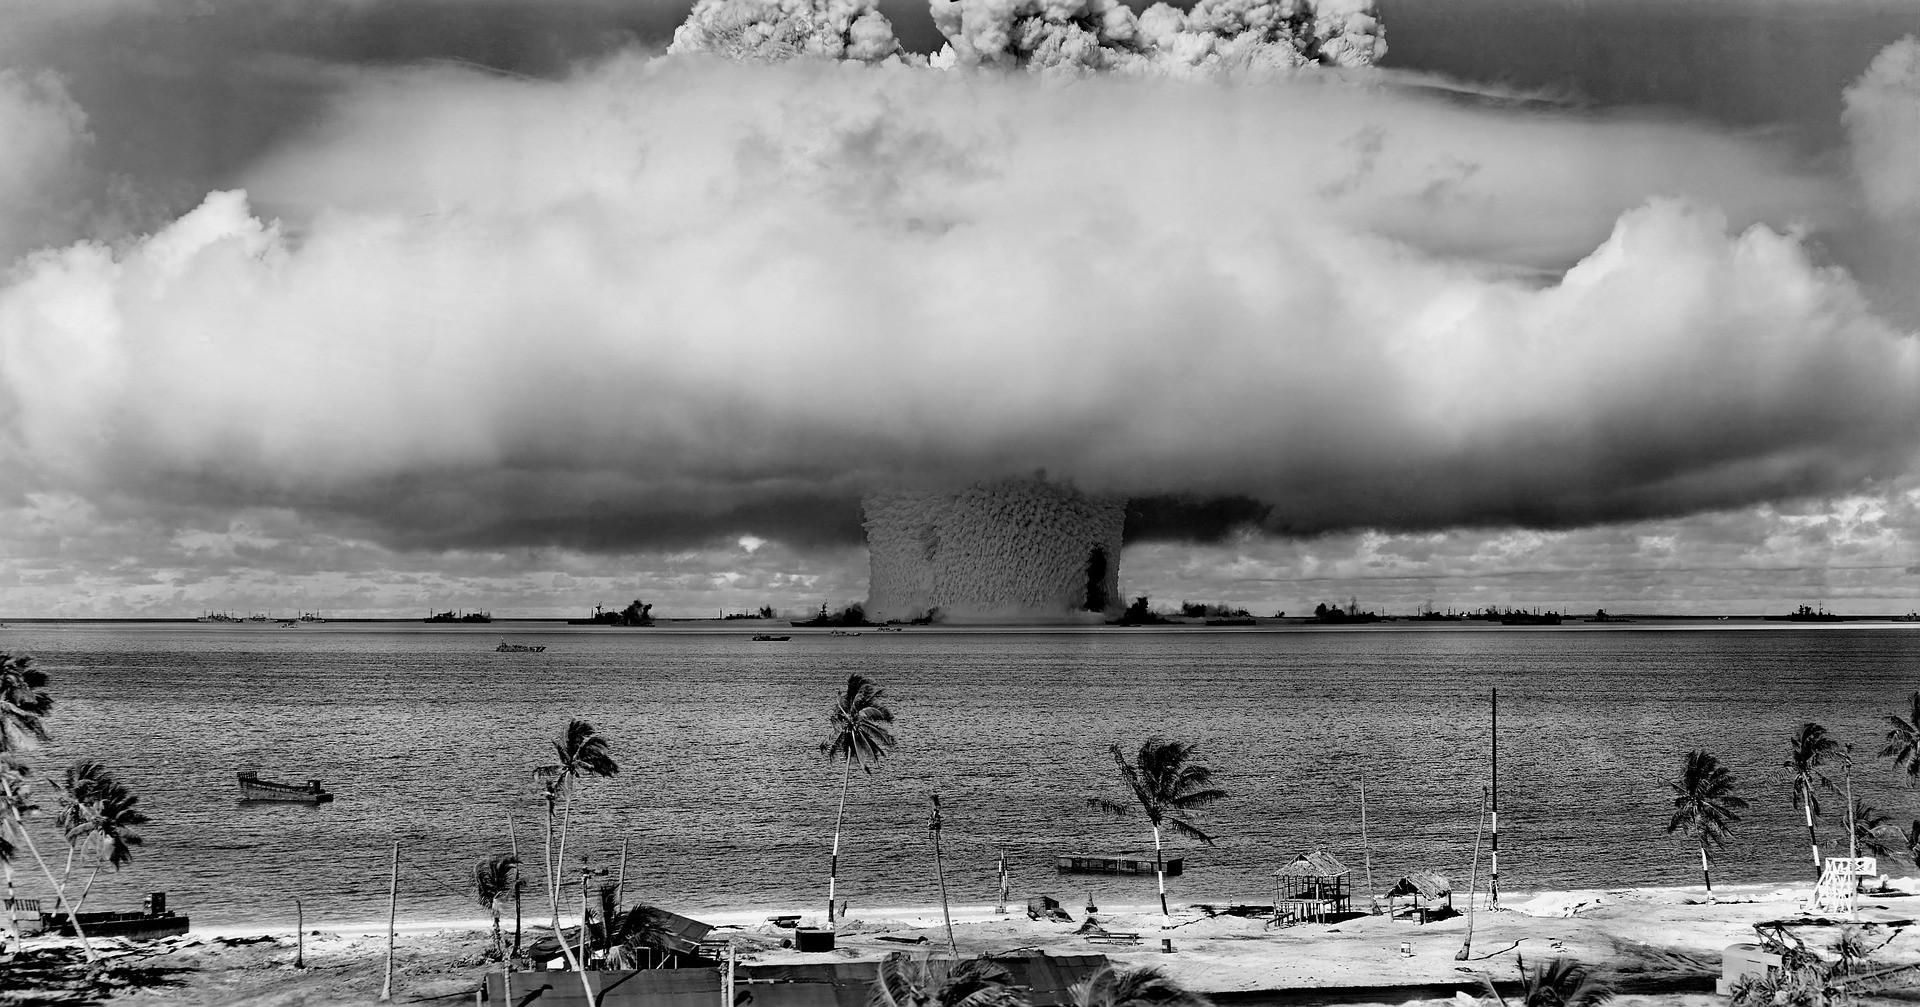 Teste nuclear (Foto: Wikimedia Commons)